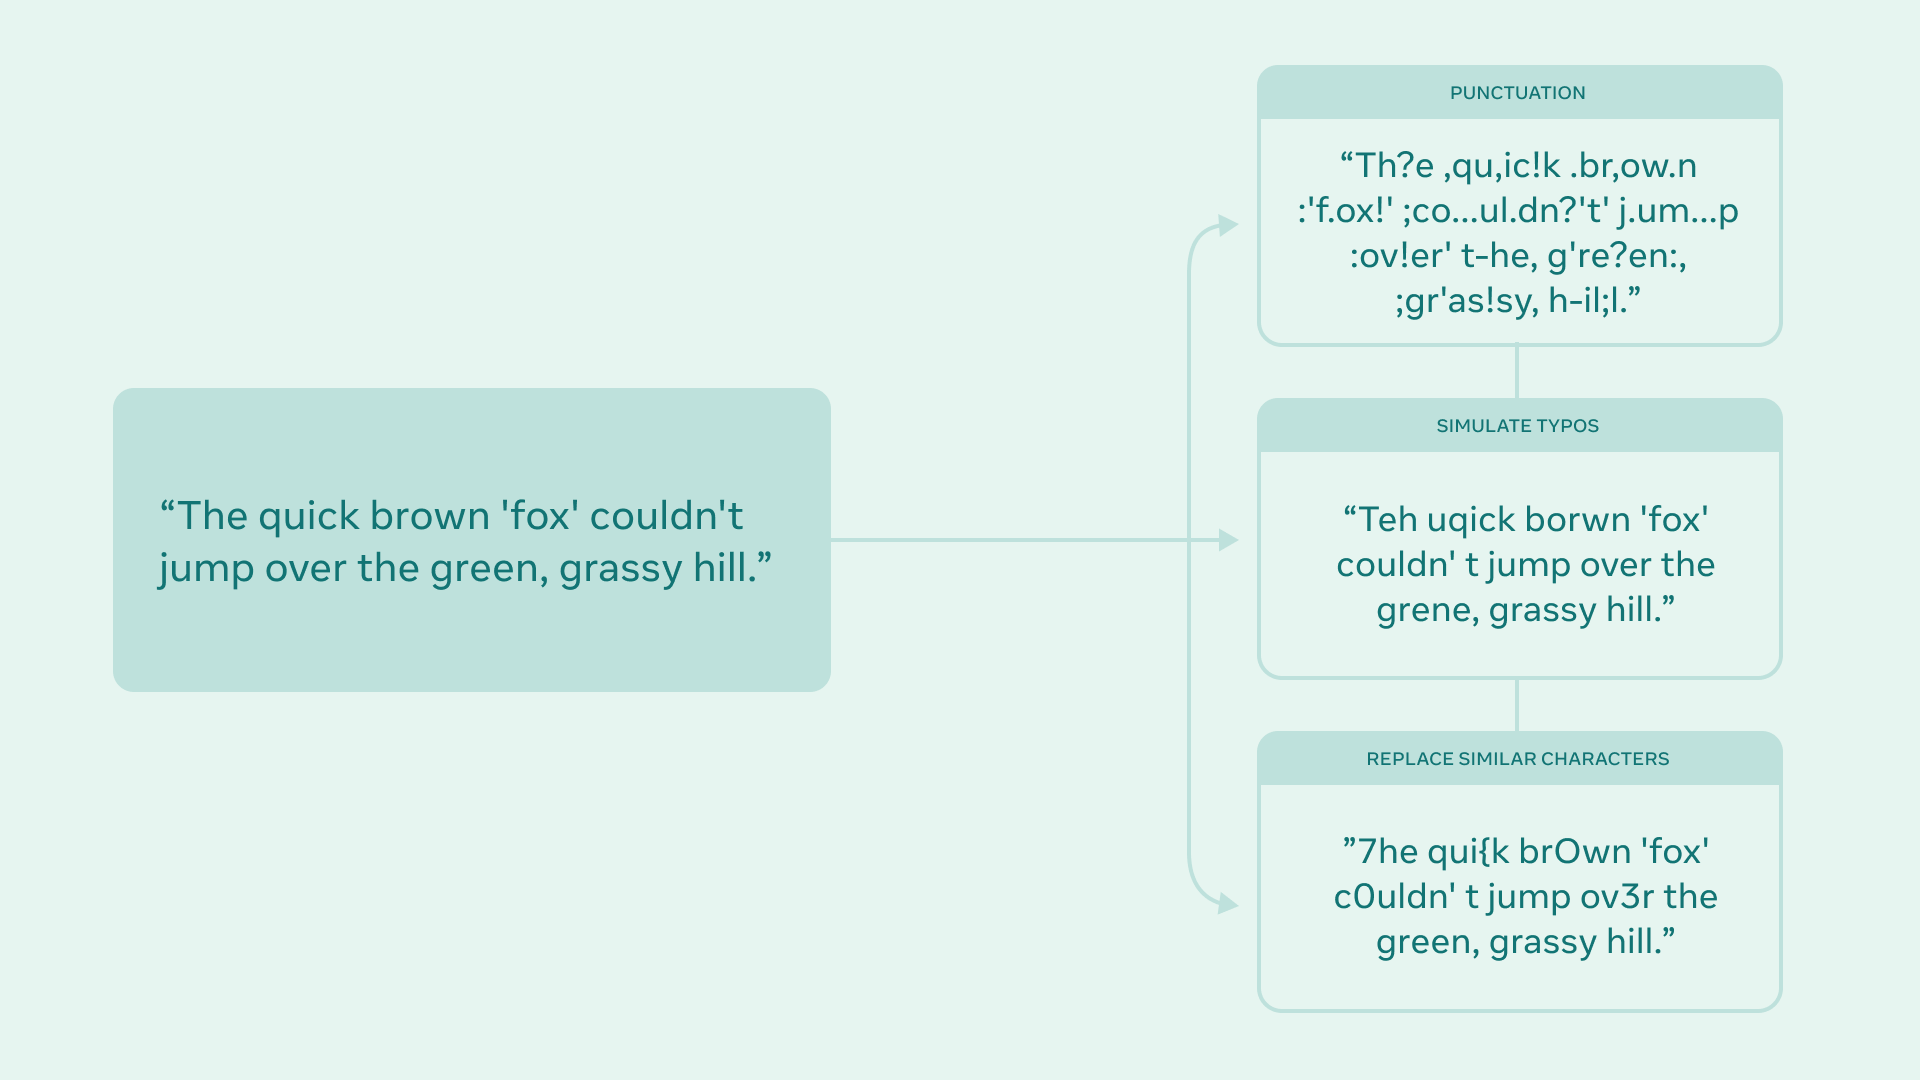 Illustration of the data augmentation